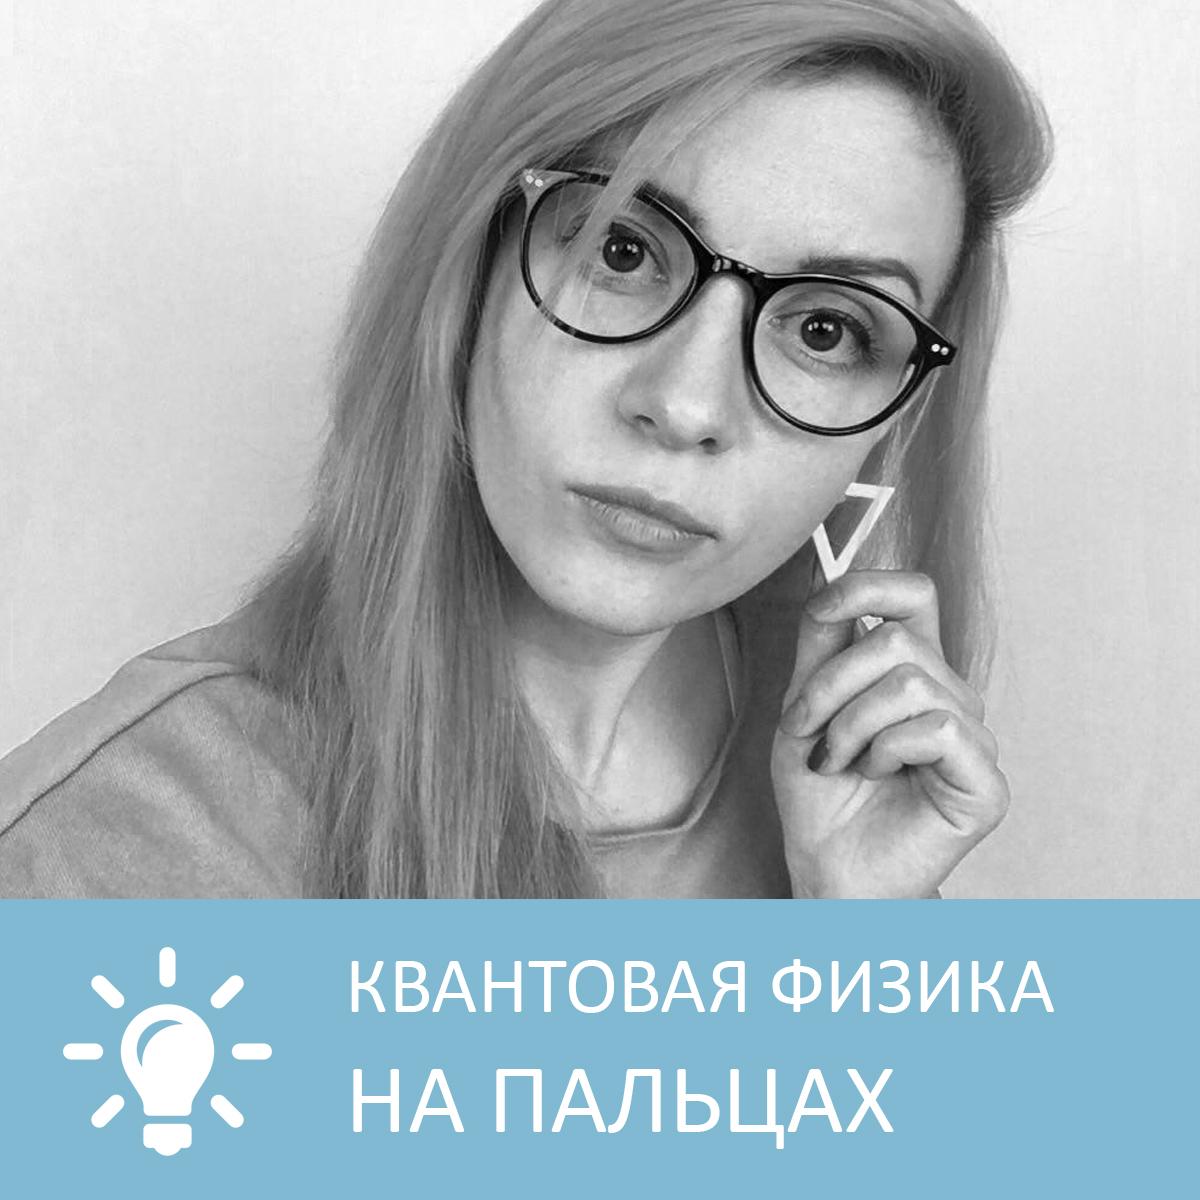 Петровна Квантовая физика на пальцах владимир неволин квантовая физика и нанотехнологии